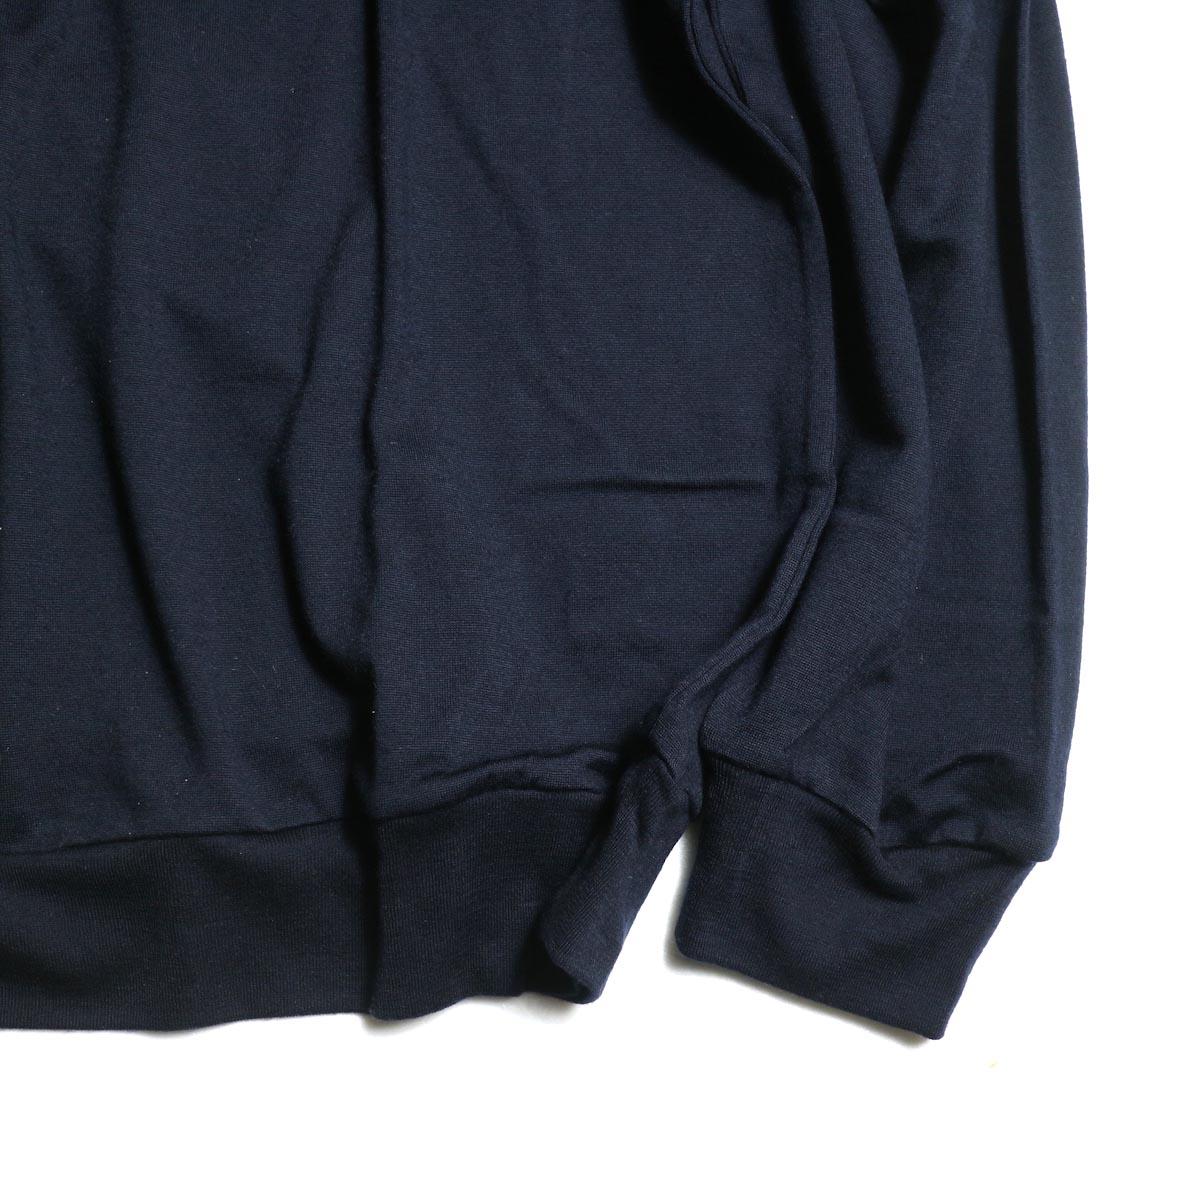 blurhms / Shrink Wool Gazette P/O (Navy)  袖、裾